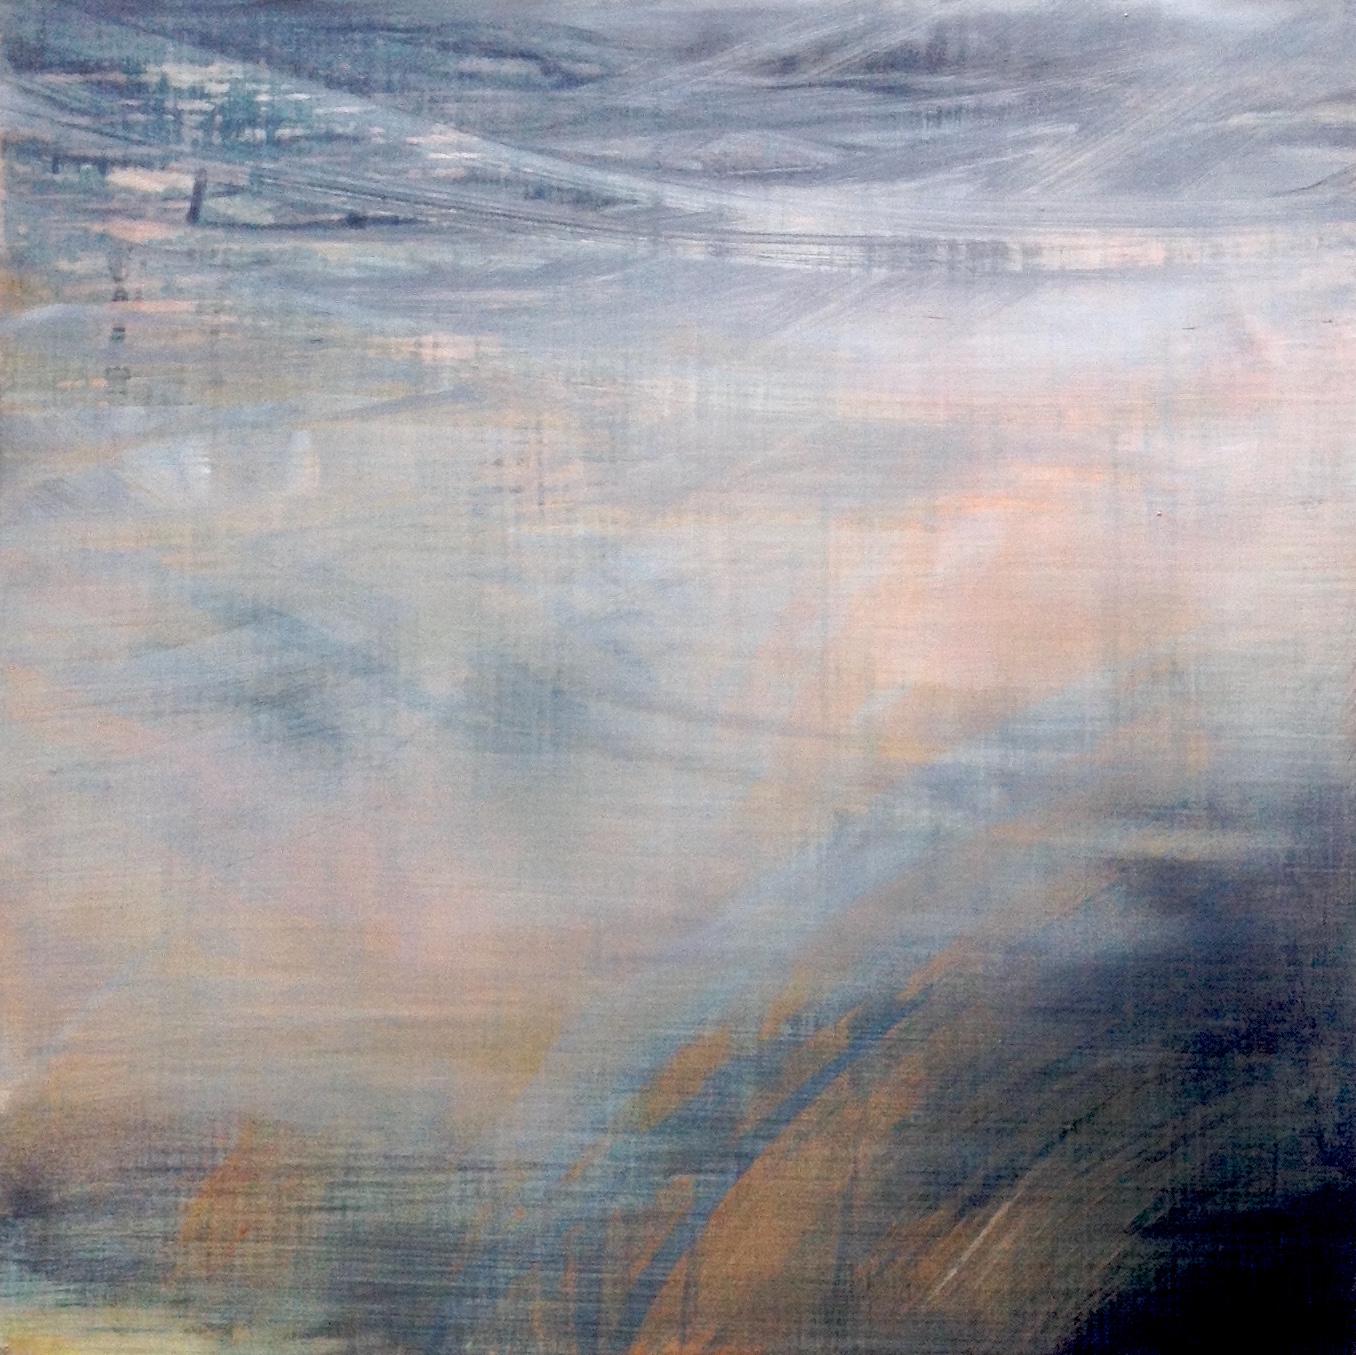 Frenz_Music of the Moment_2016_acrylic on masonite panel_12x12.jpg